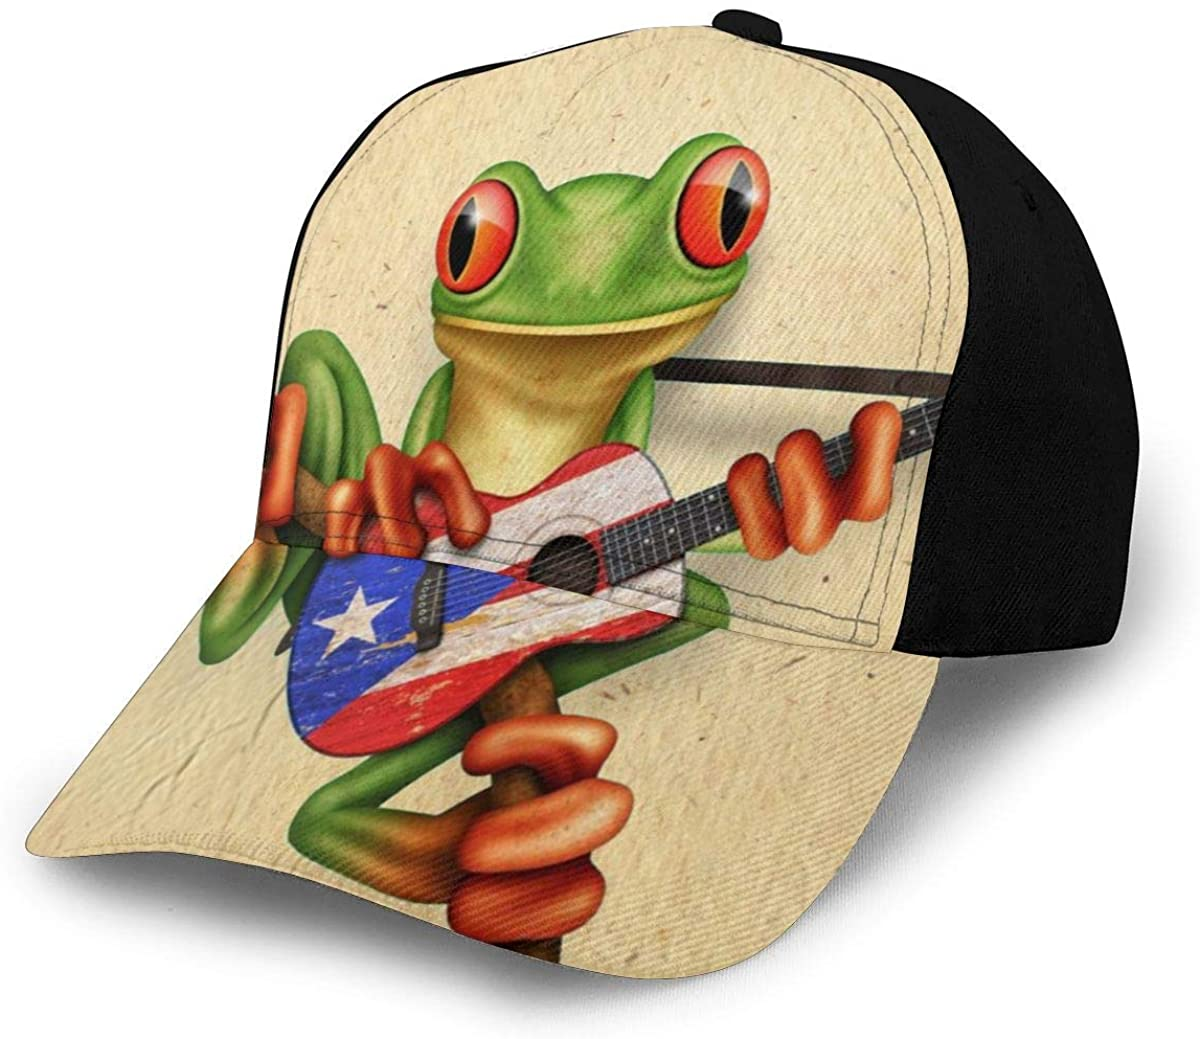 Nicokee Tree Frog Playing Puerto Rico Flag Guitar Hat Baseball Cap Adjustable Snapback Hats Ball Hat for Men and Women